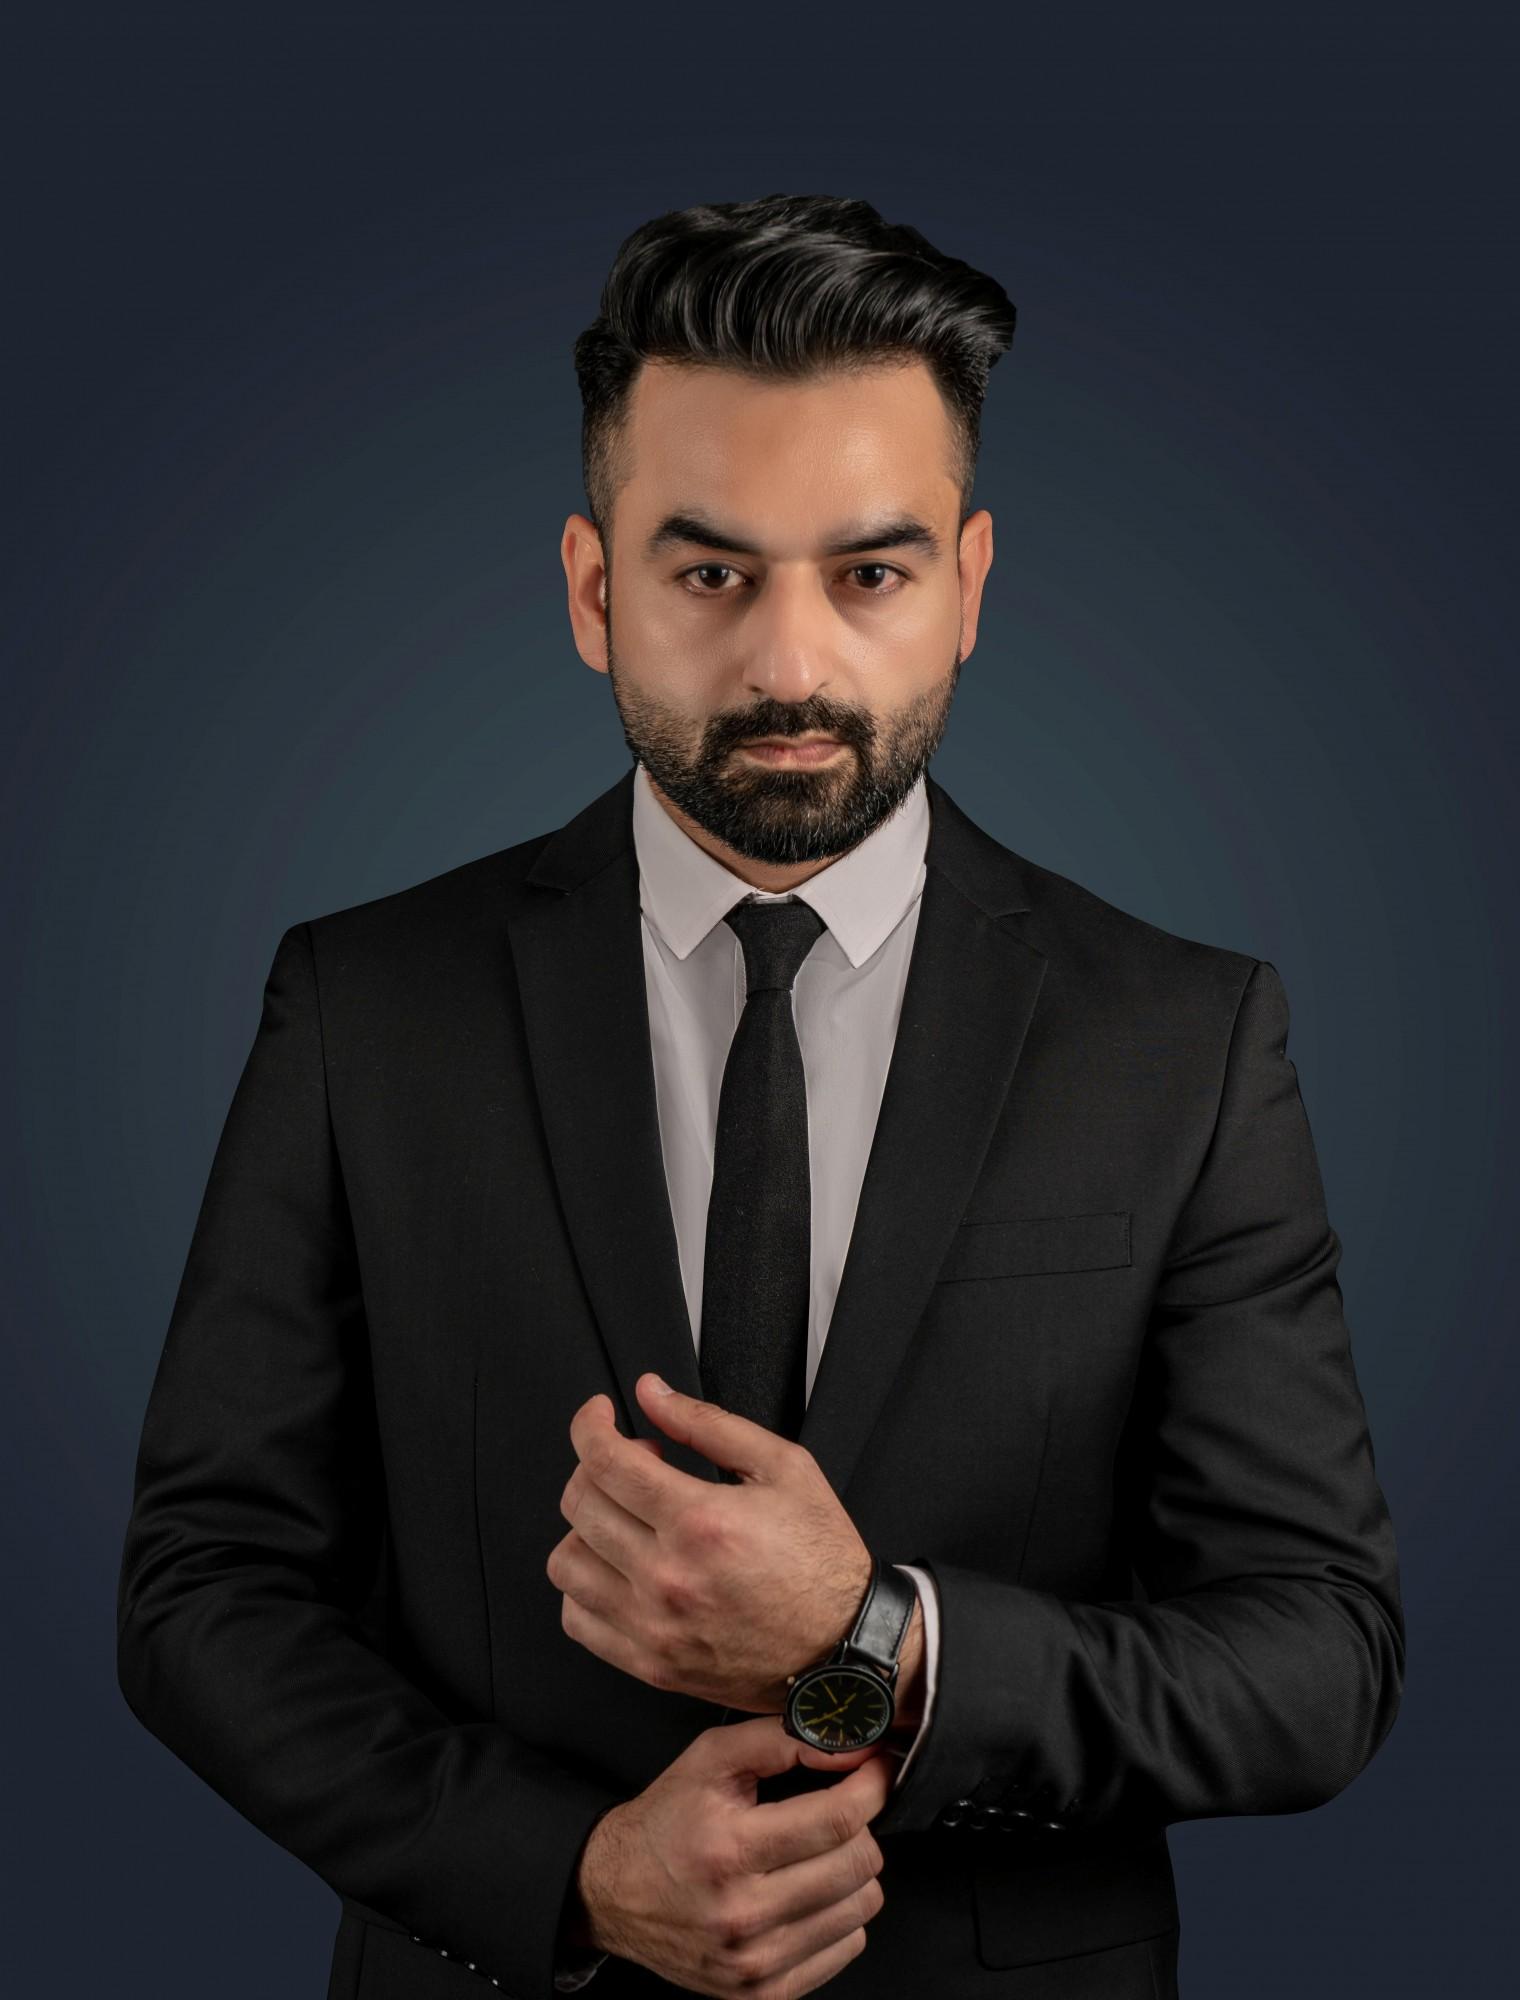 Jawad Ahmed